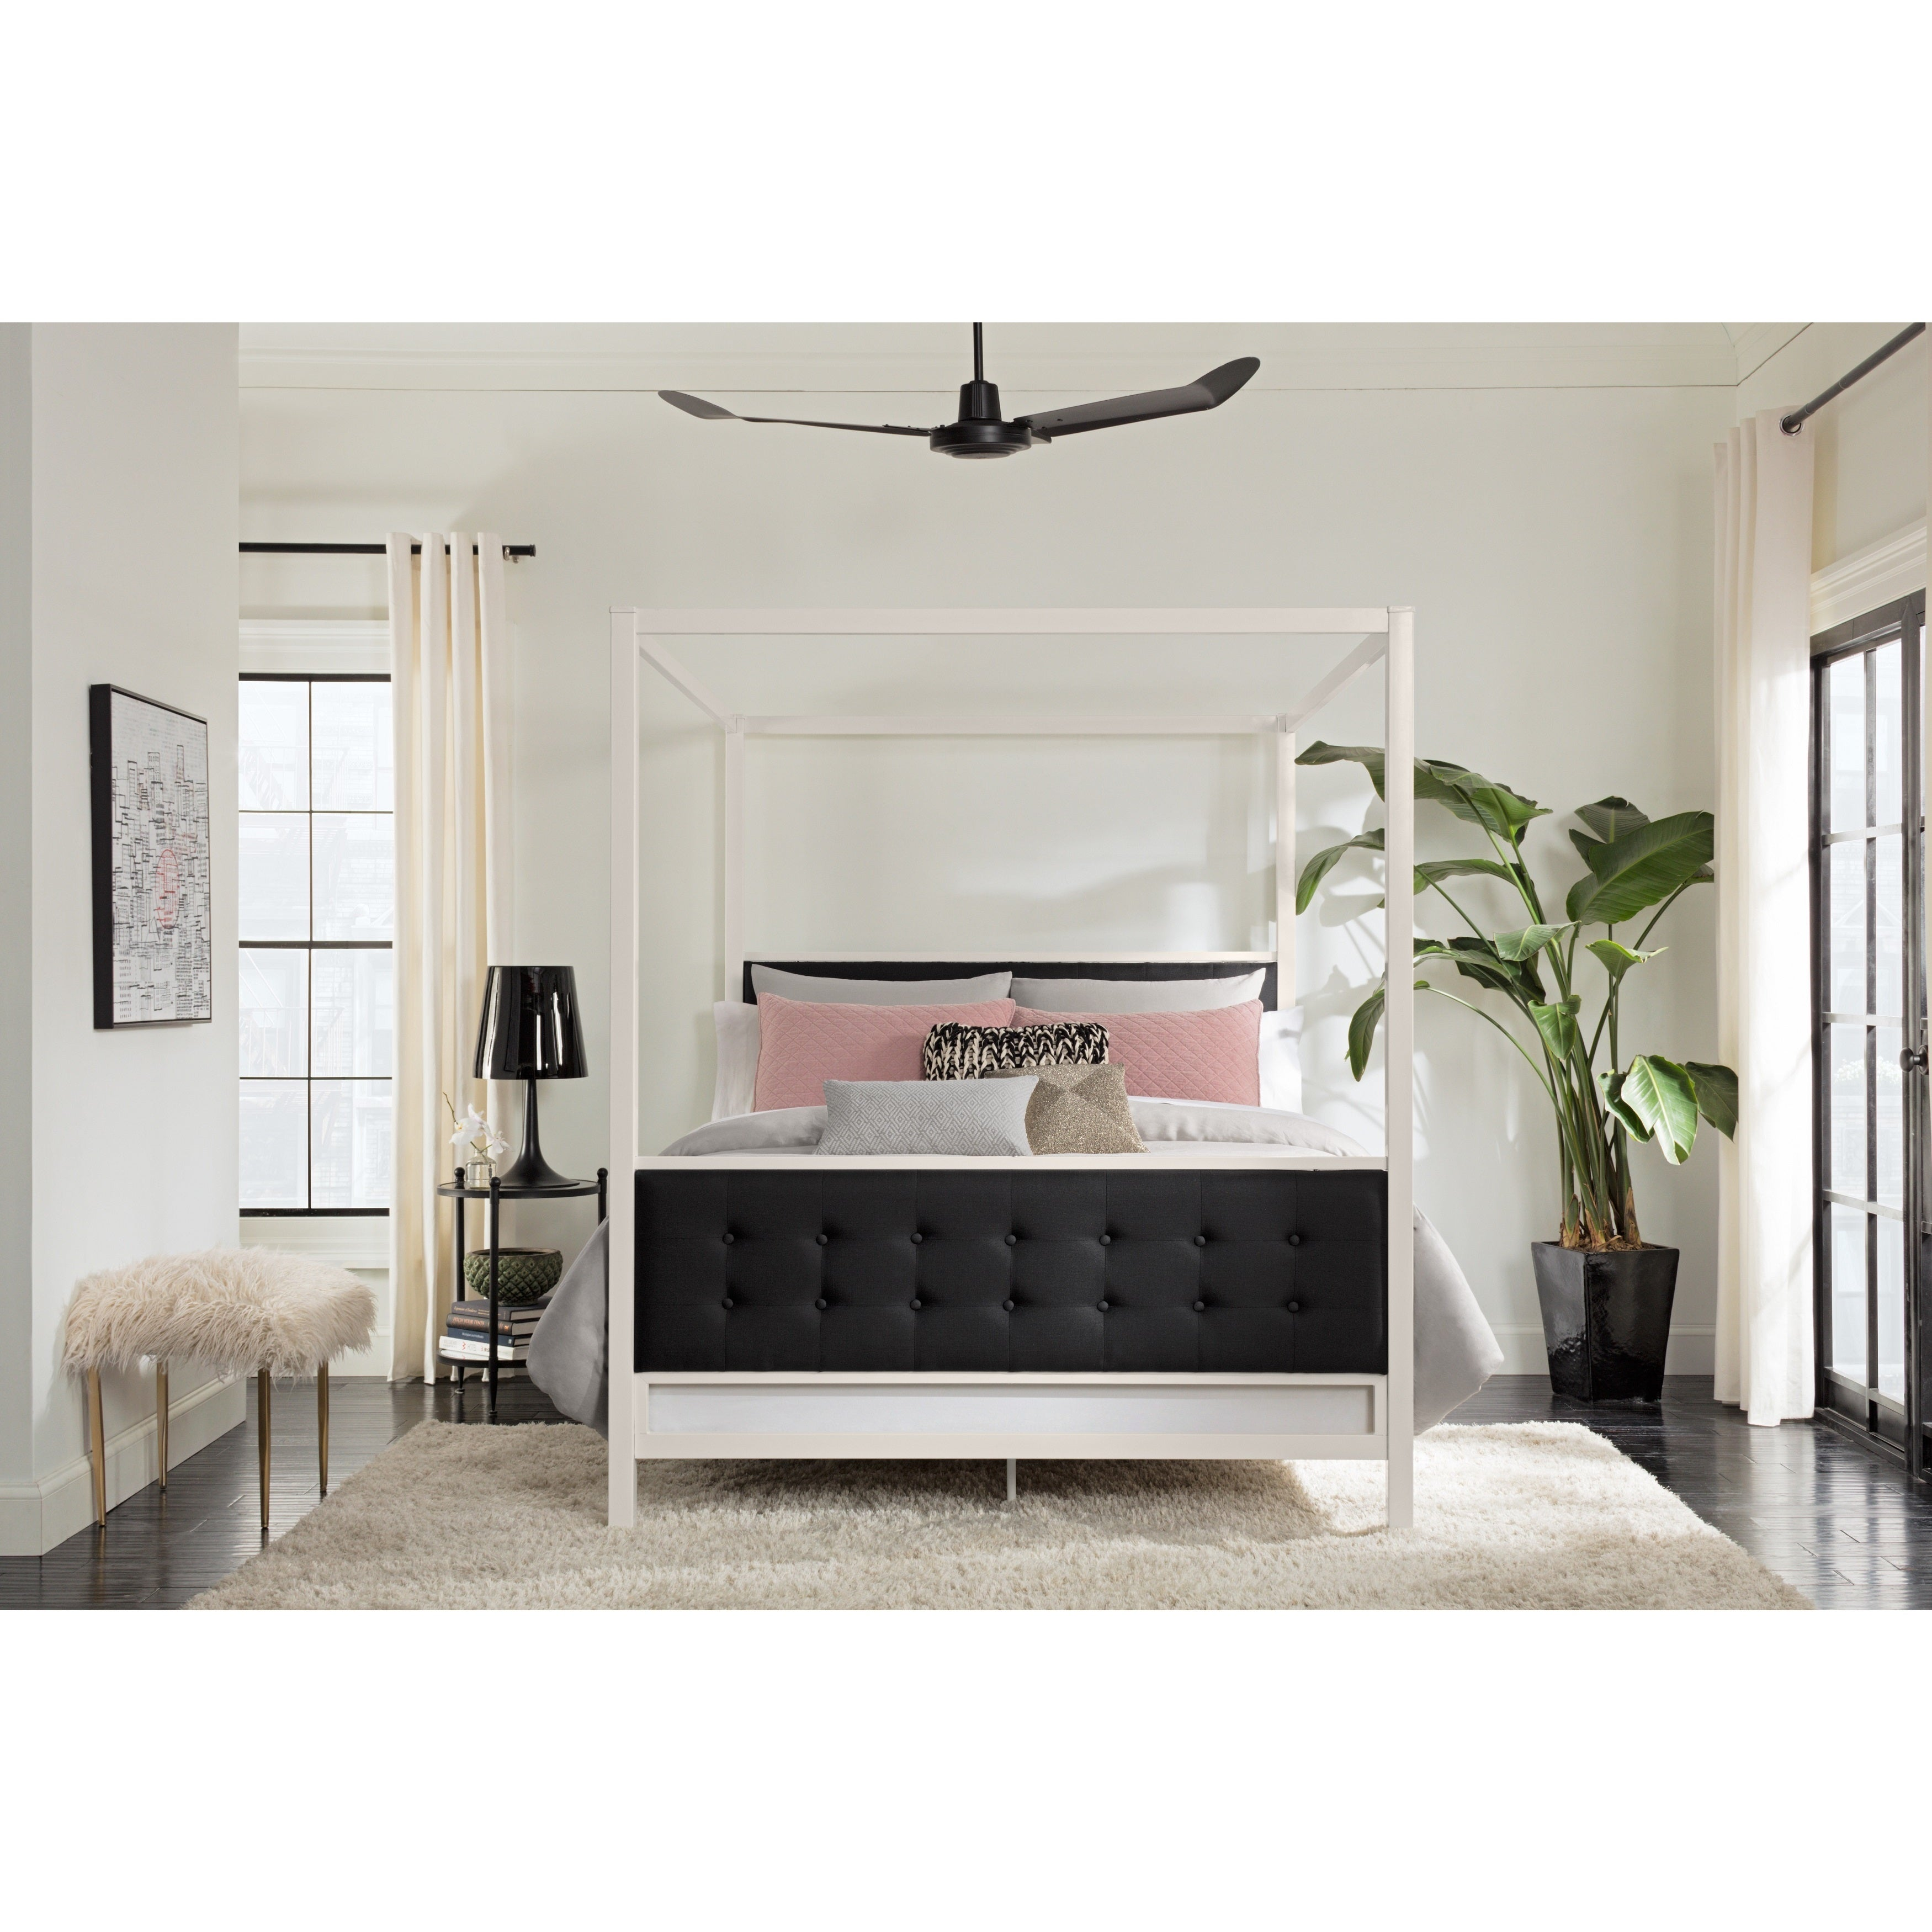 Shop Dhp Soho Modern White Metal With Black Linen Queen